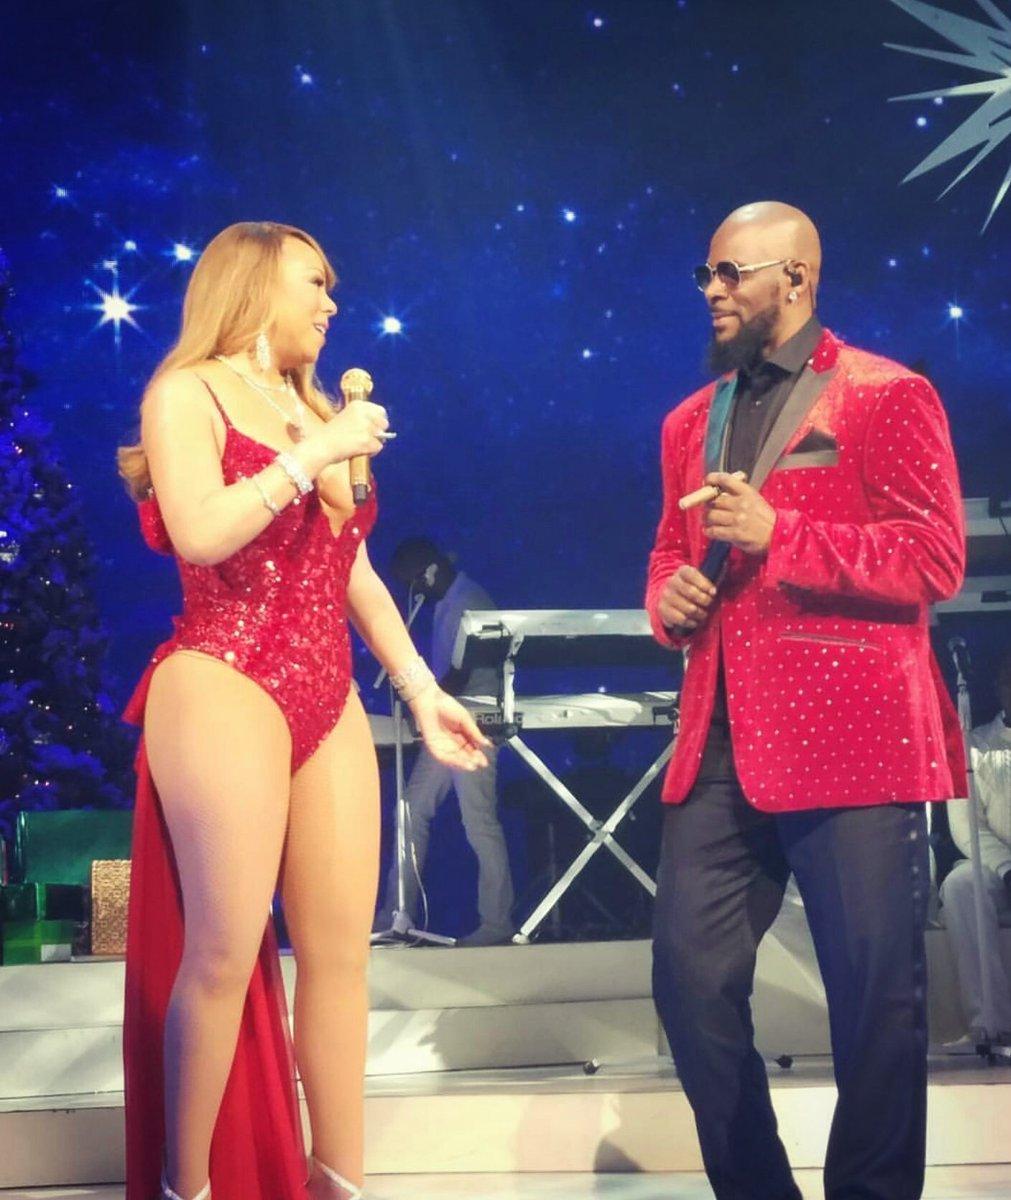 Mariah Carey Christmas Song.Watch Mariah Carey R Kelly Perform The Christmas Song